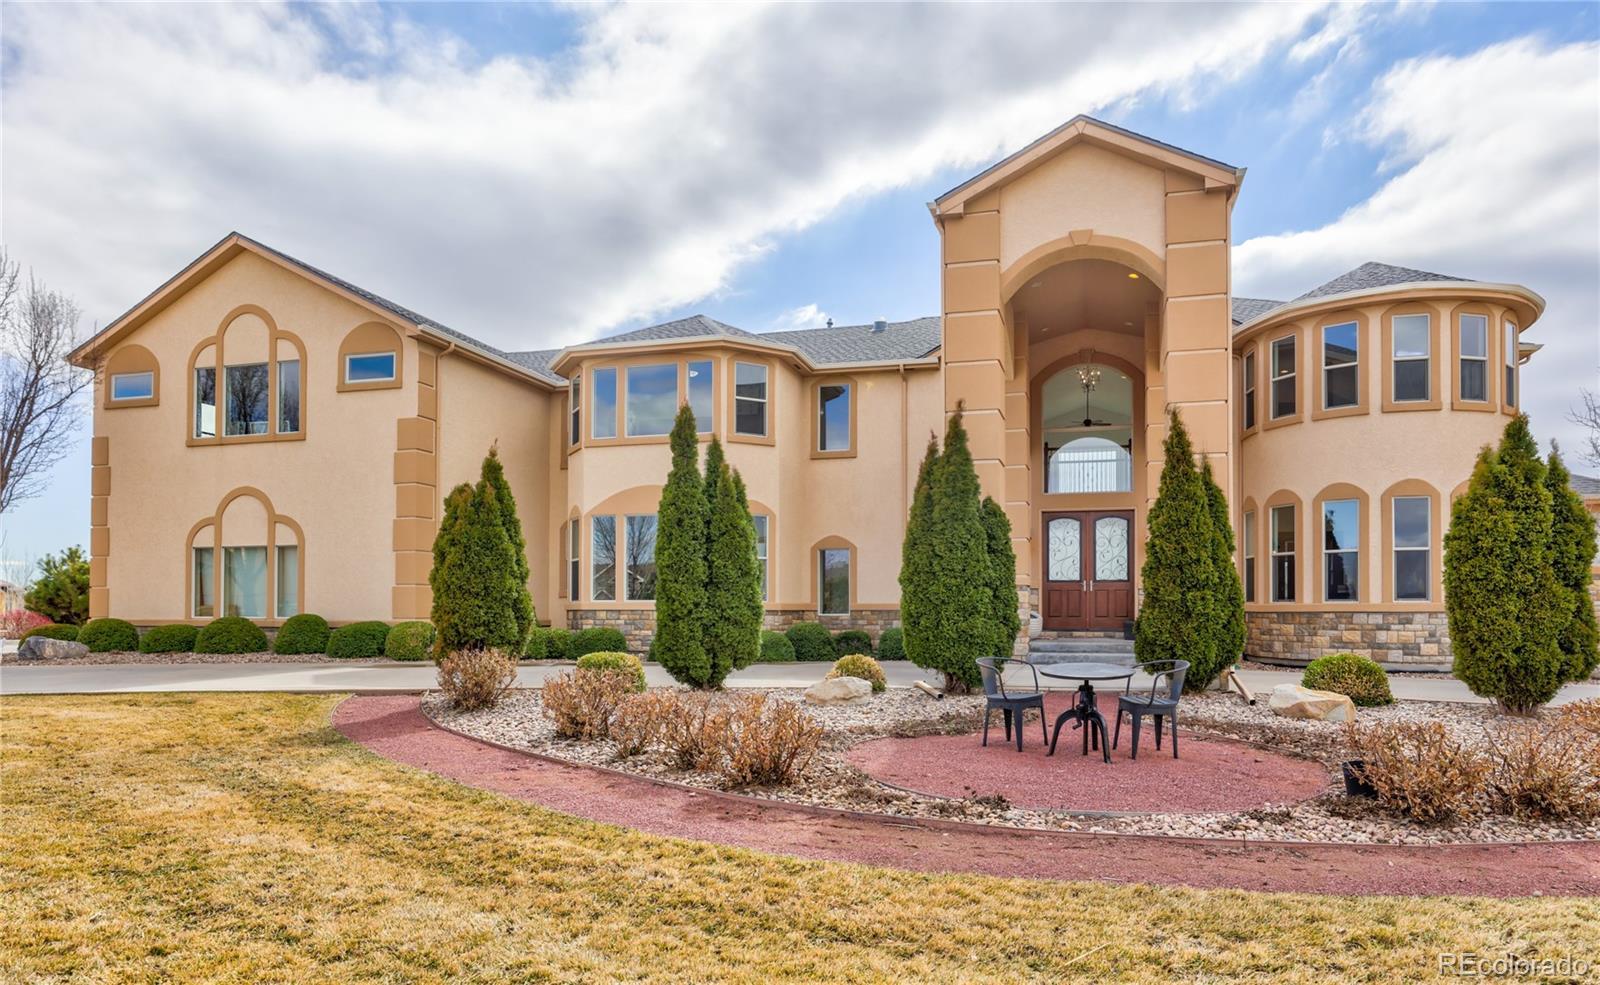 8400 E 130th Circle, Thornton, CO 80602 - Thornton, CO real estate listing